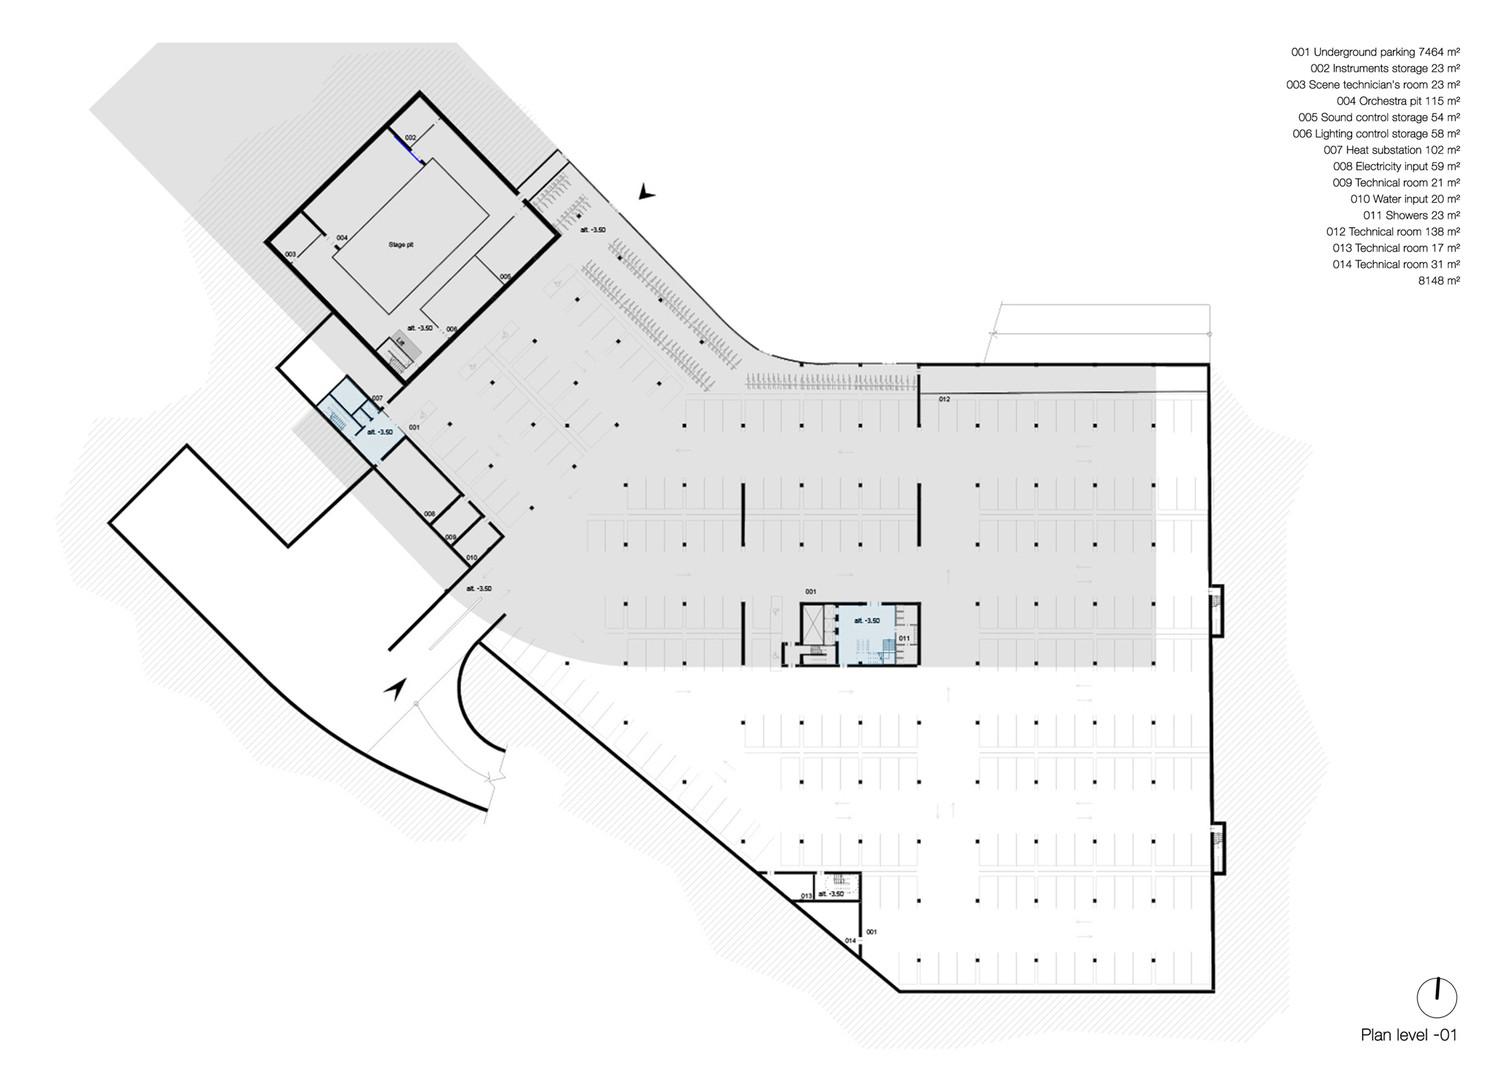 Plan level -01